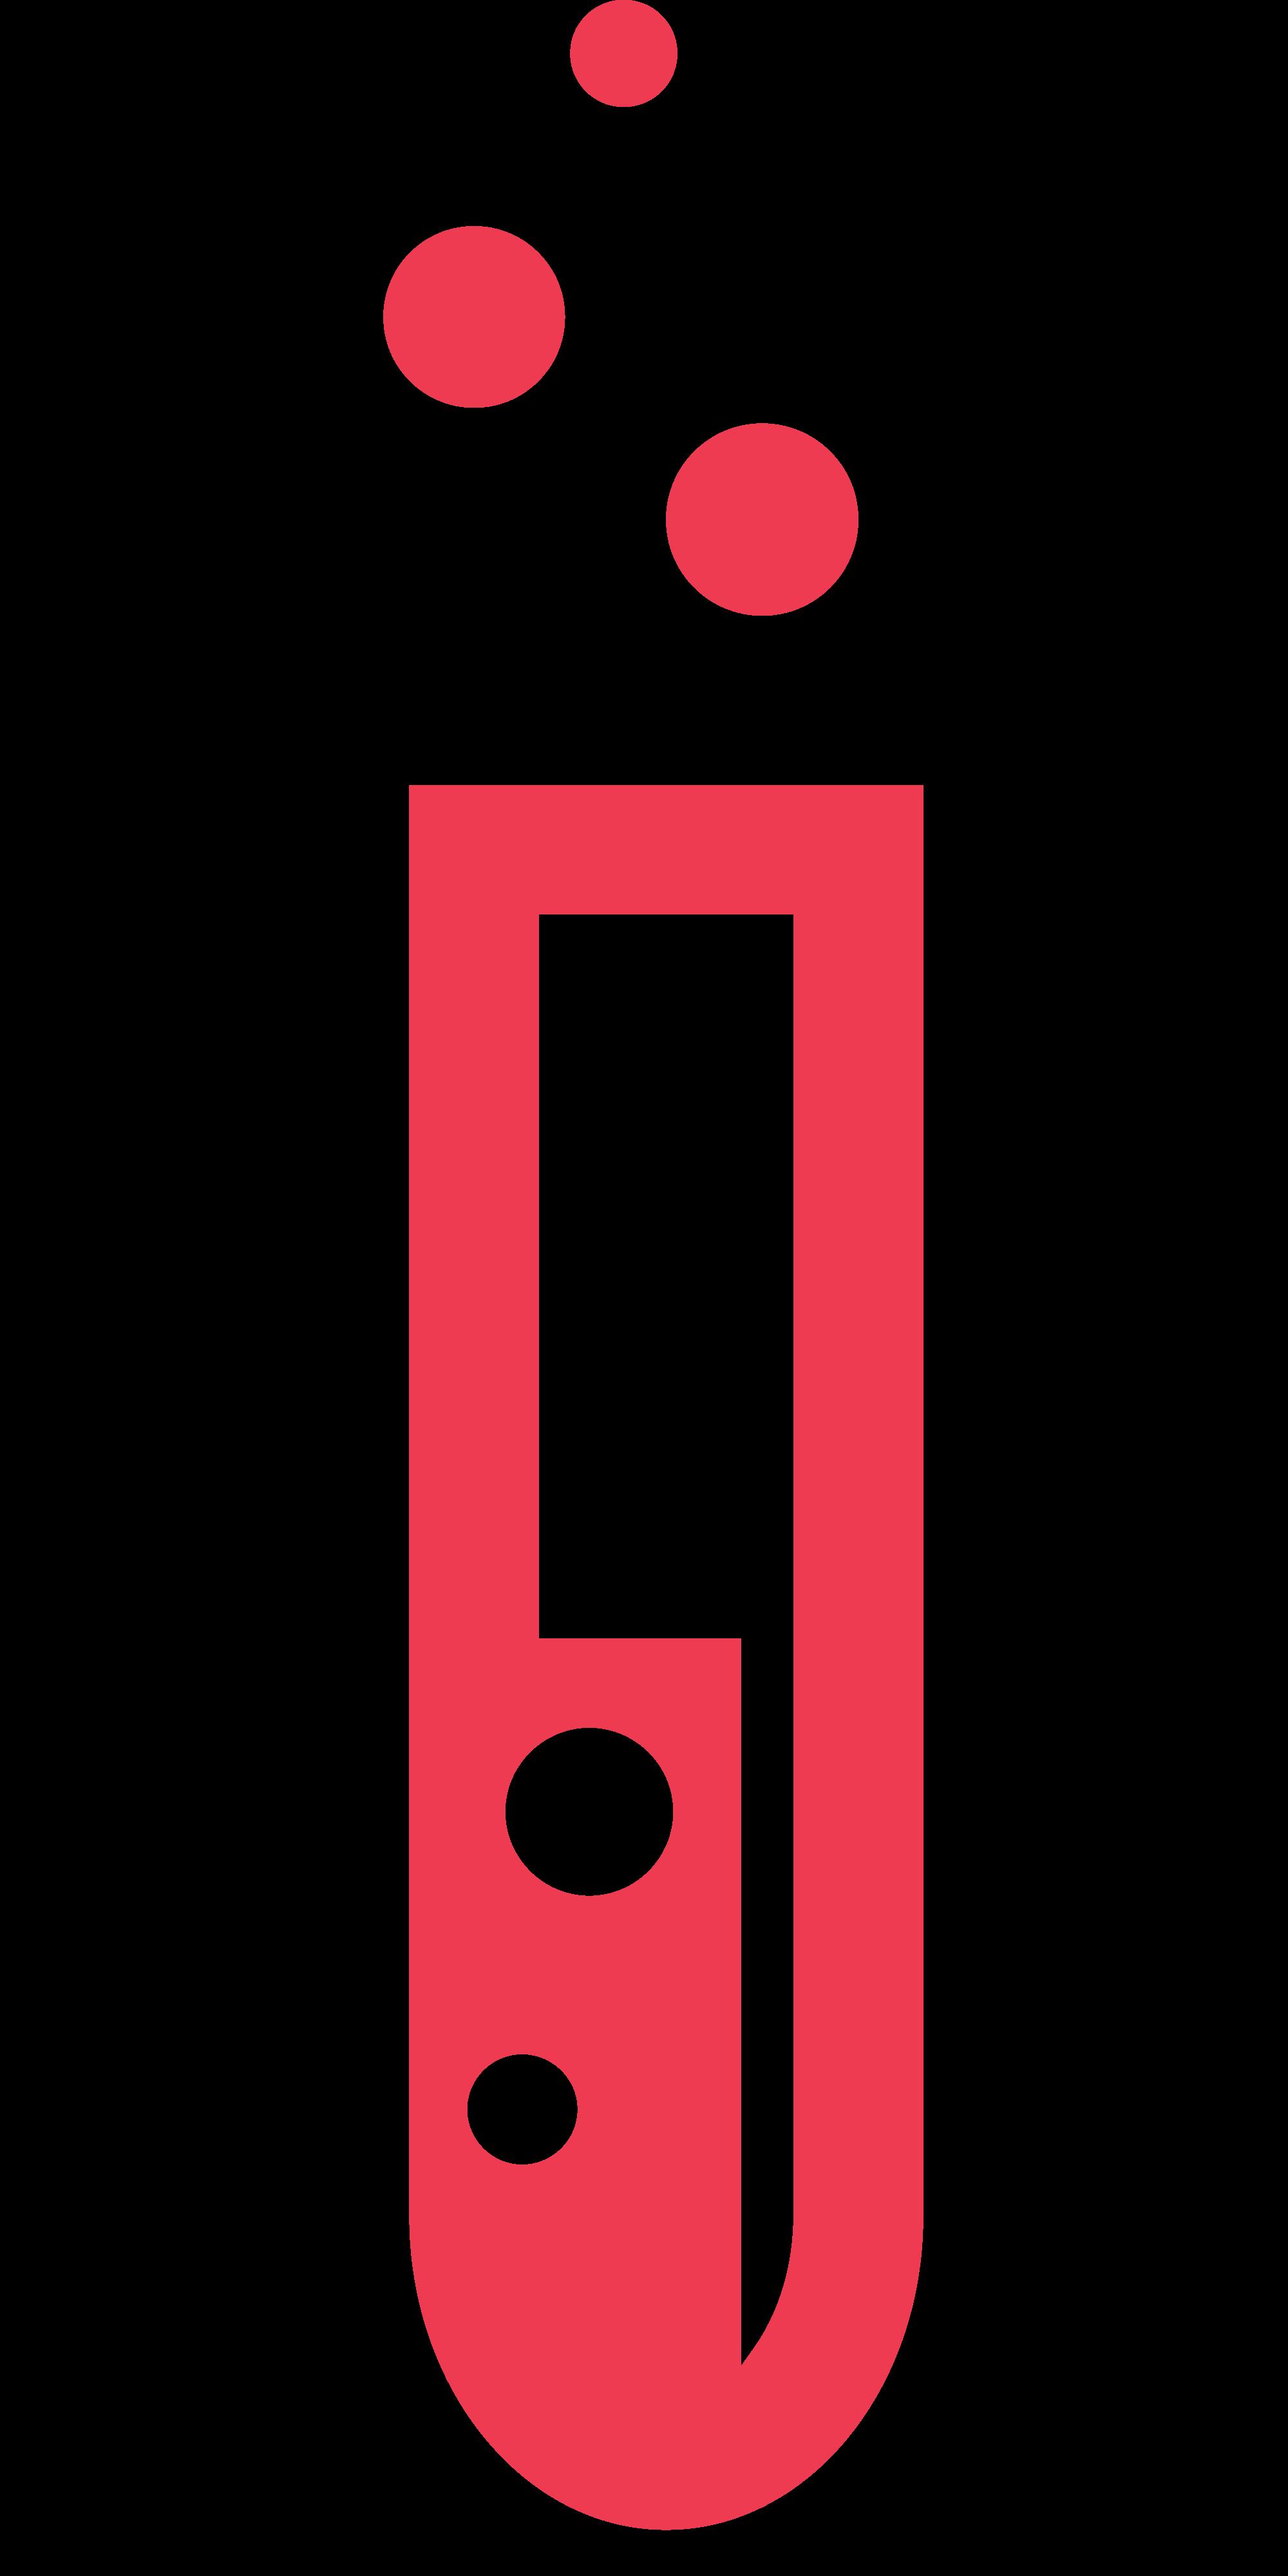 Test clipart svg. File idealab tube wikimedia